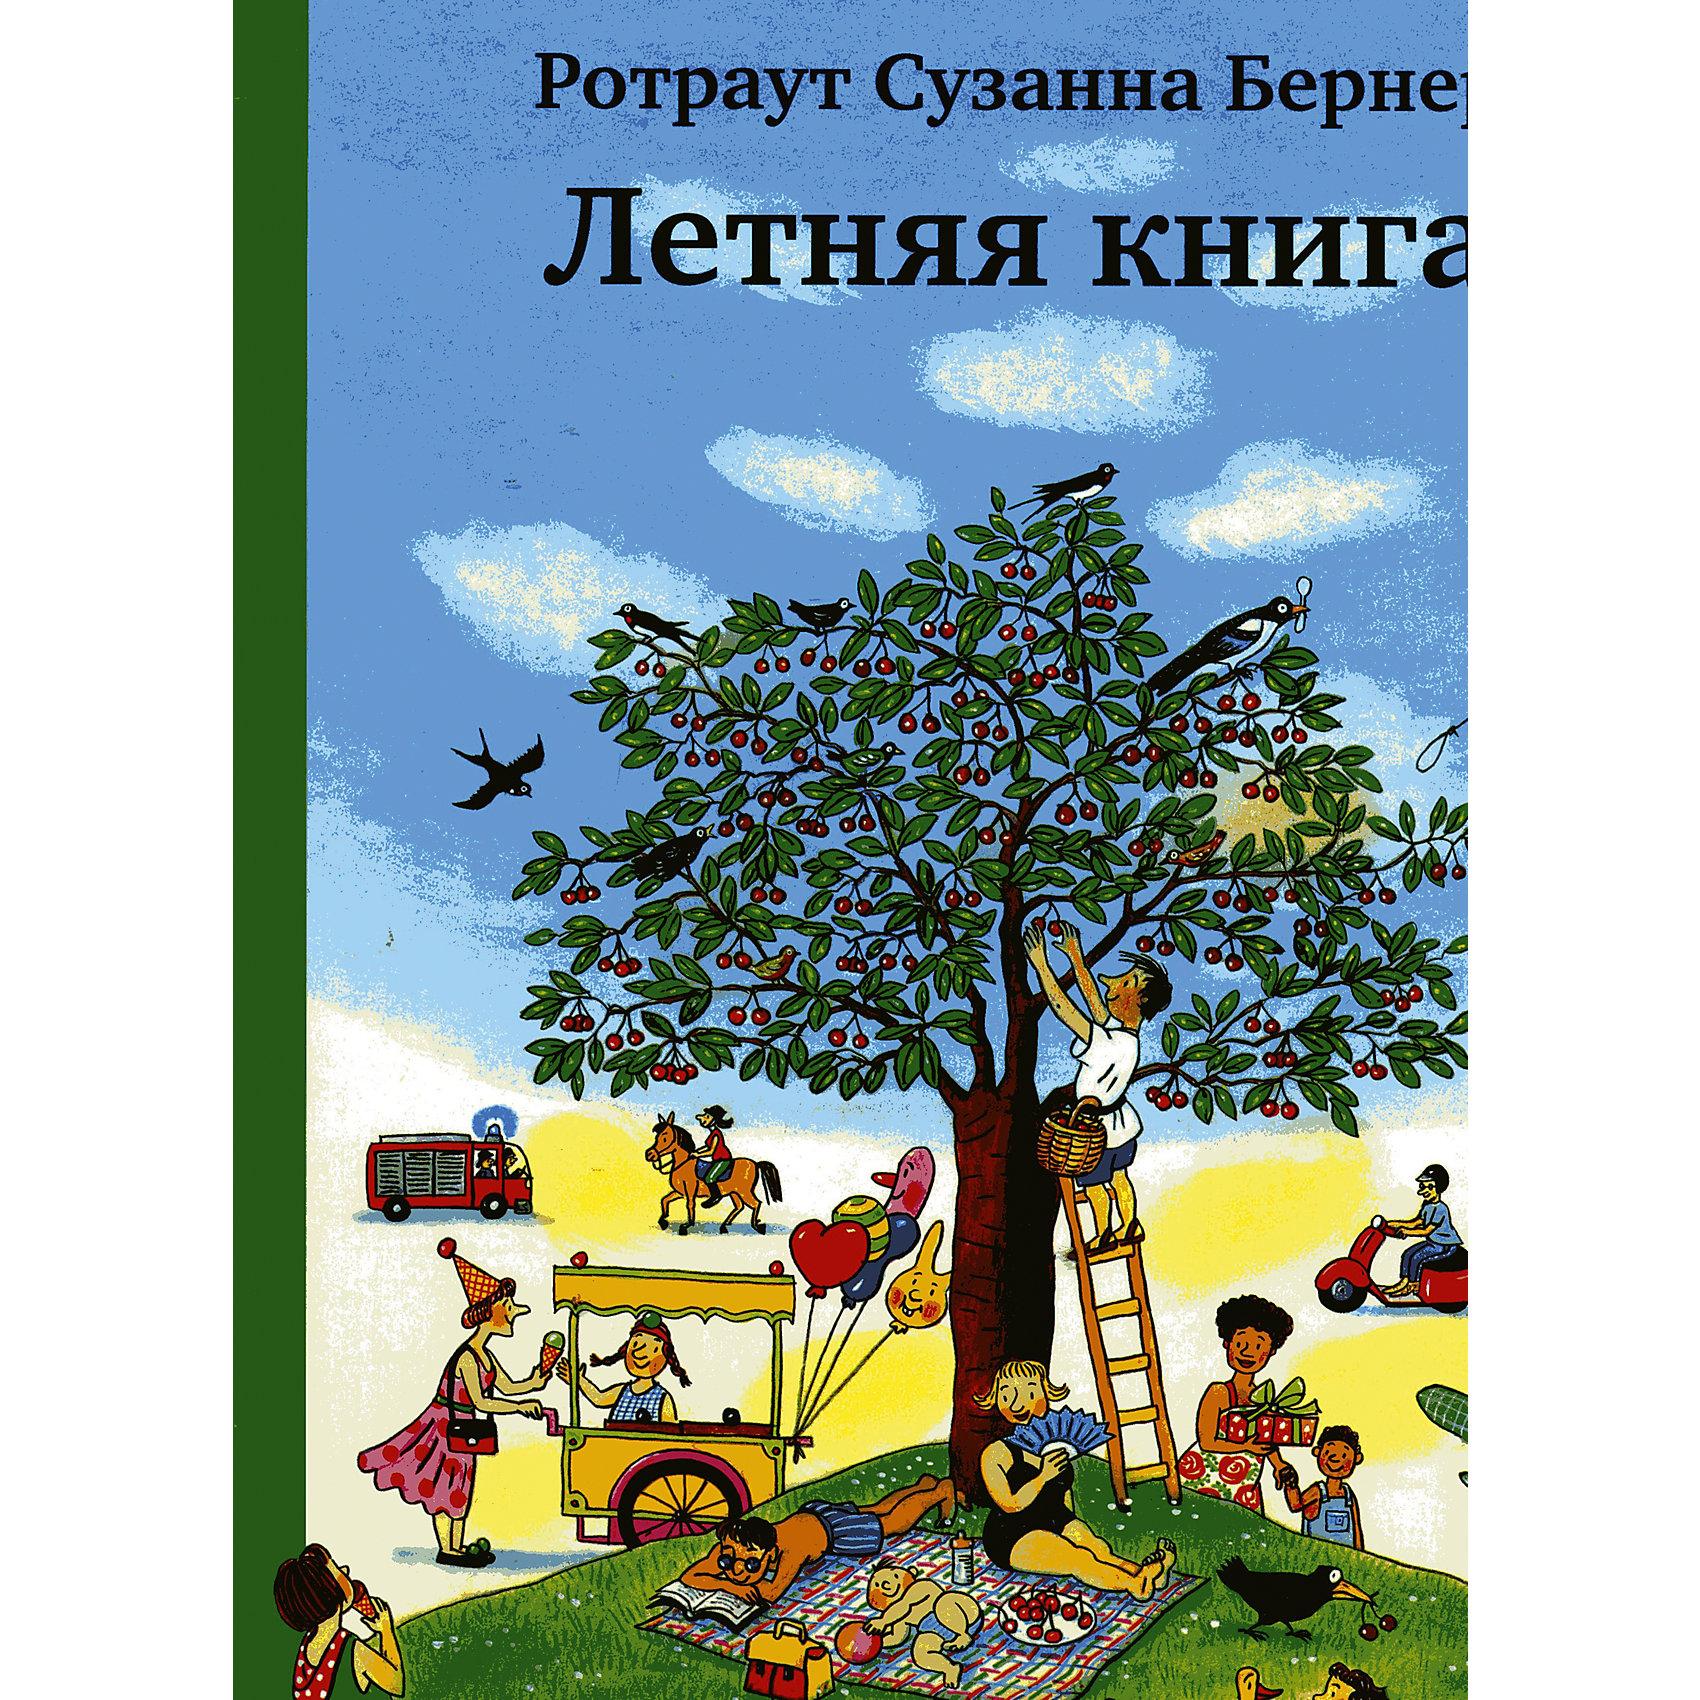 Самокат Летняя книга, Р.С. Бернер